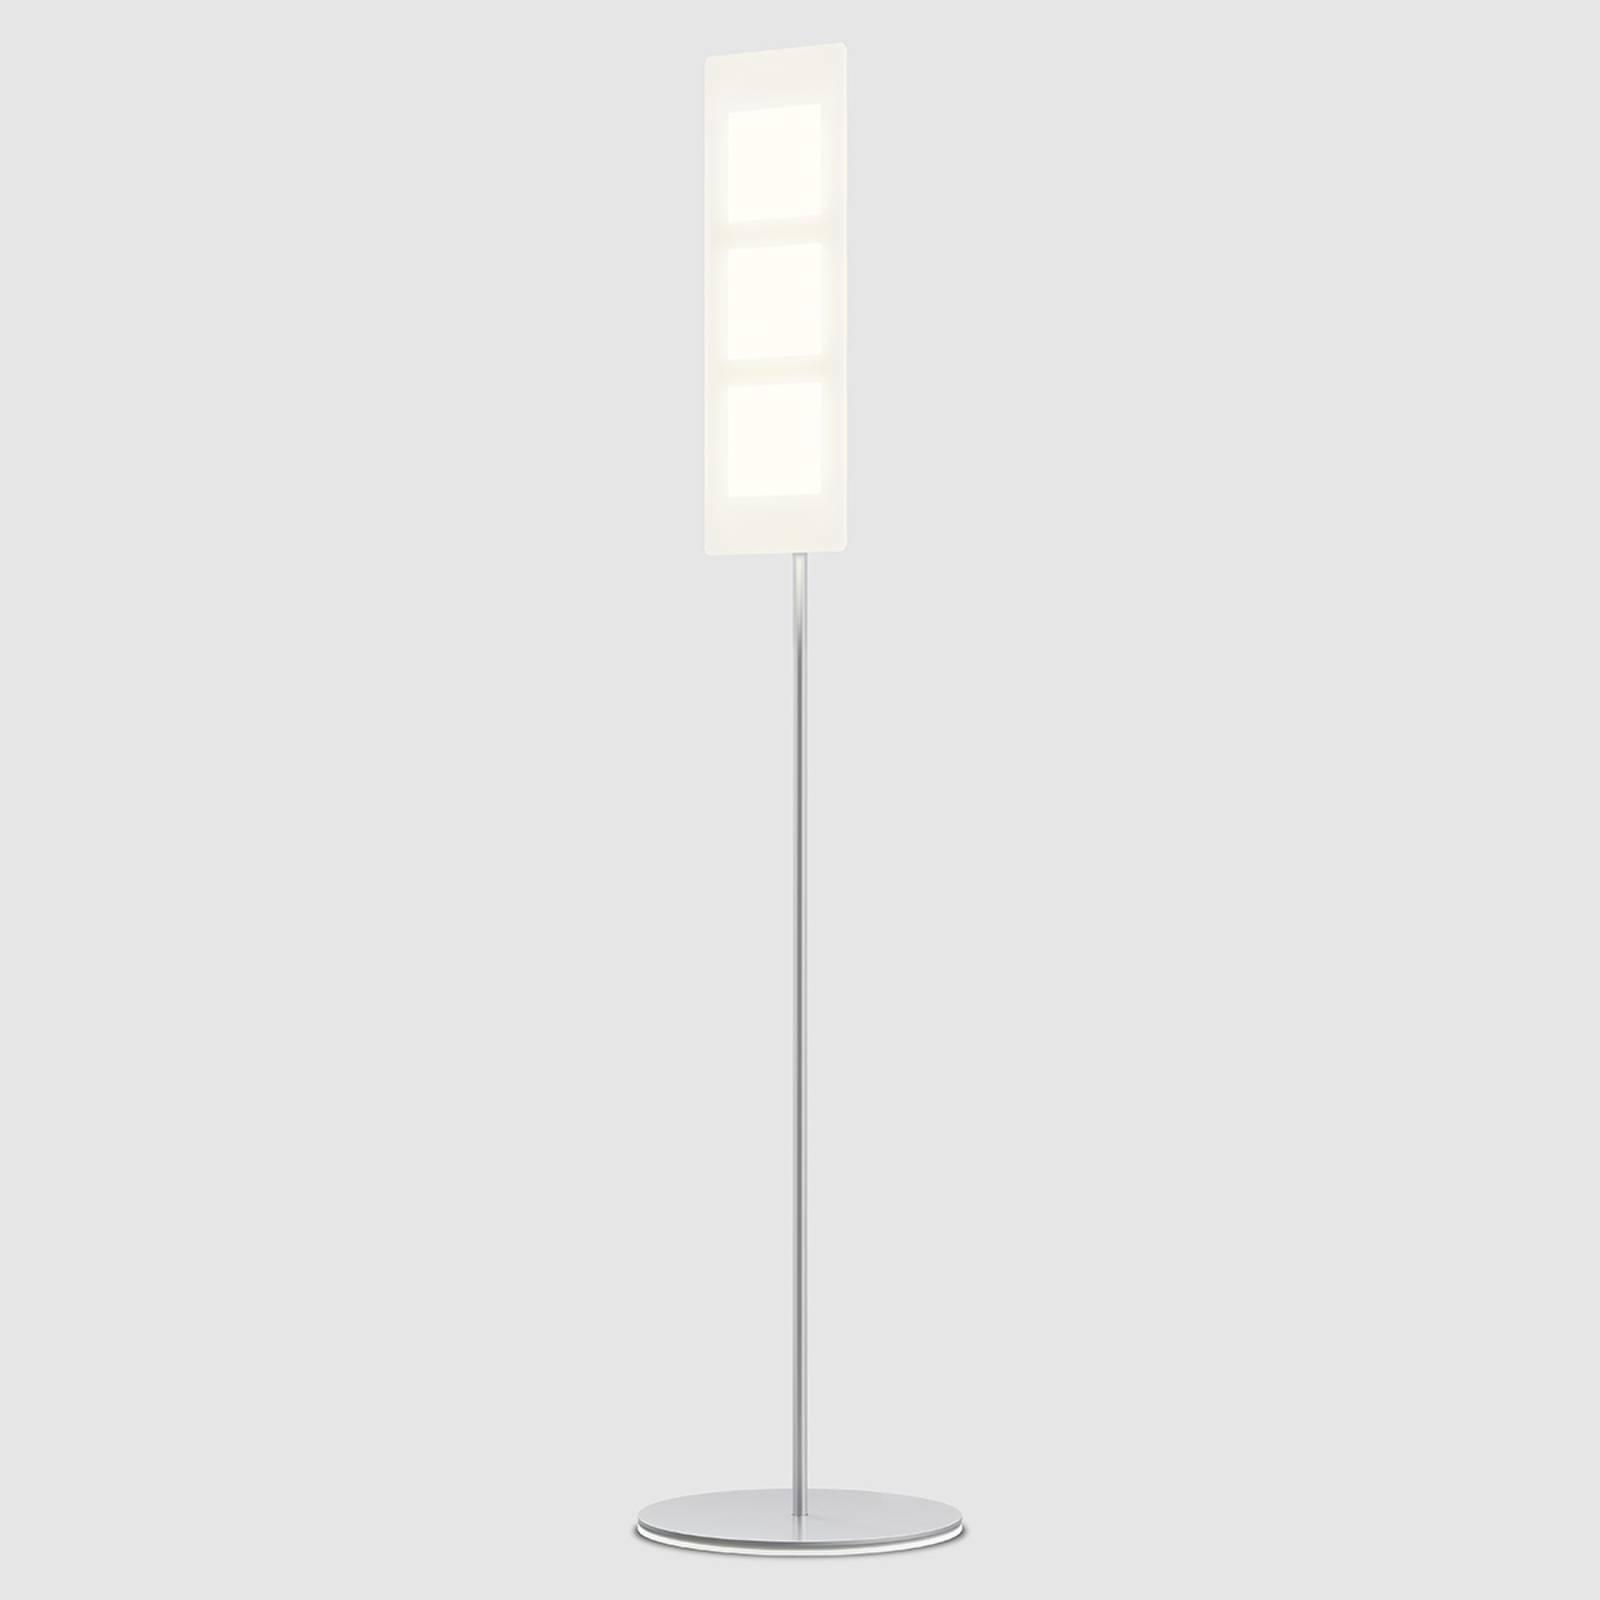 OMLED One f3 - OLED vloerlamp in Wit